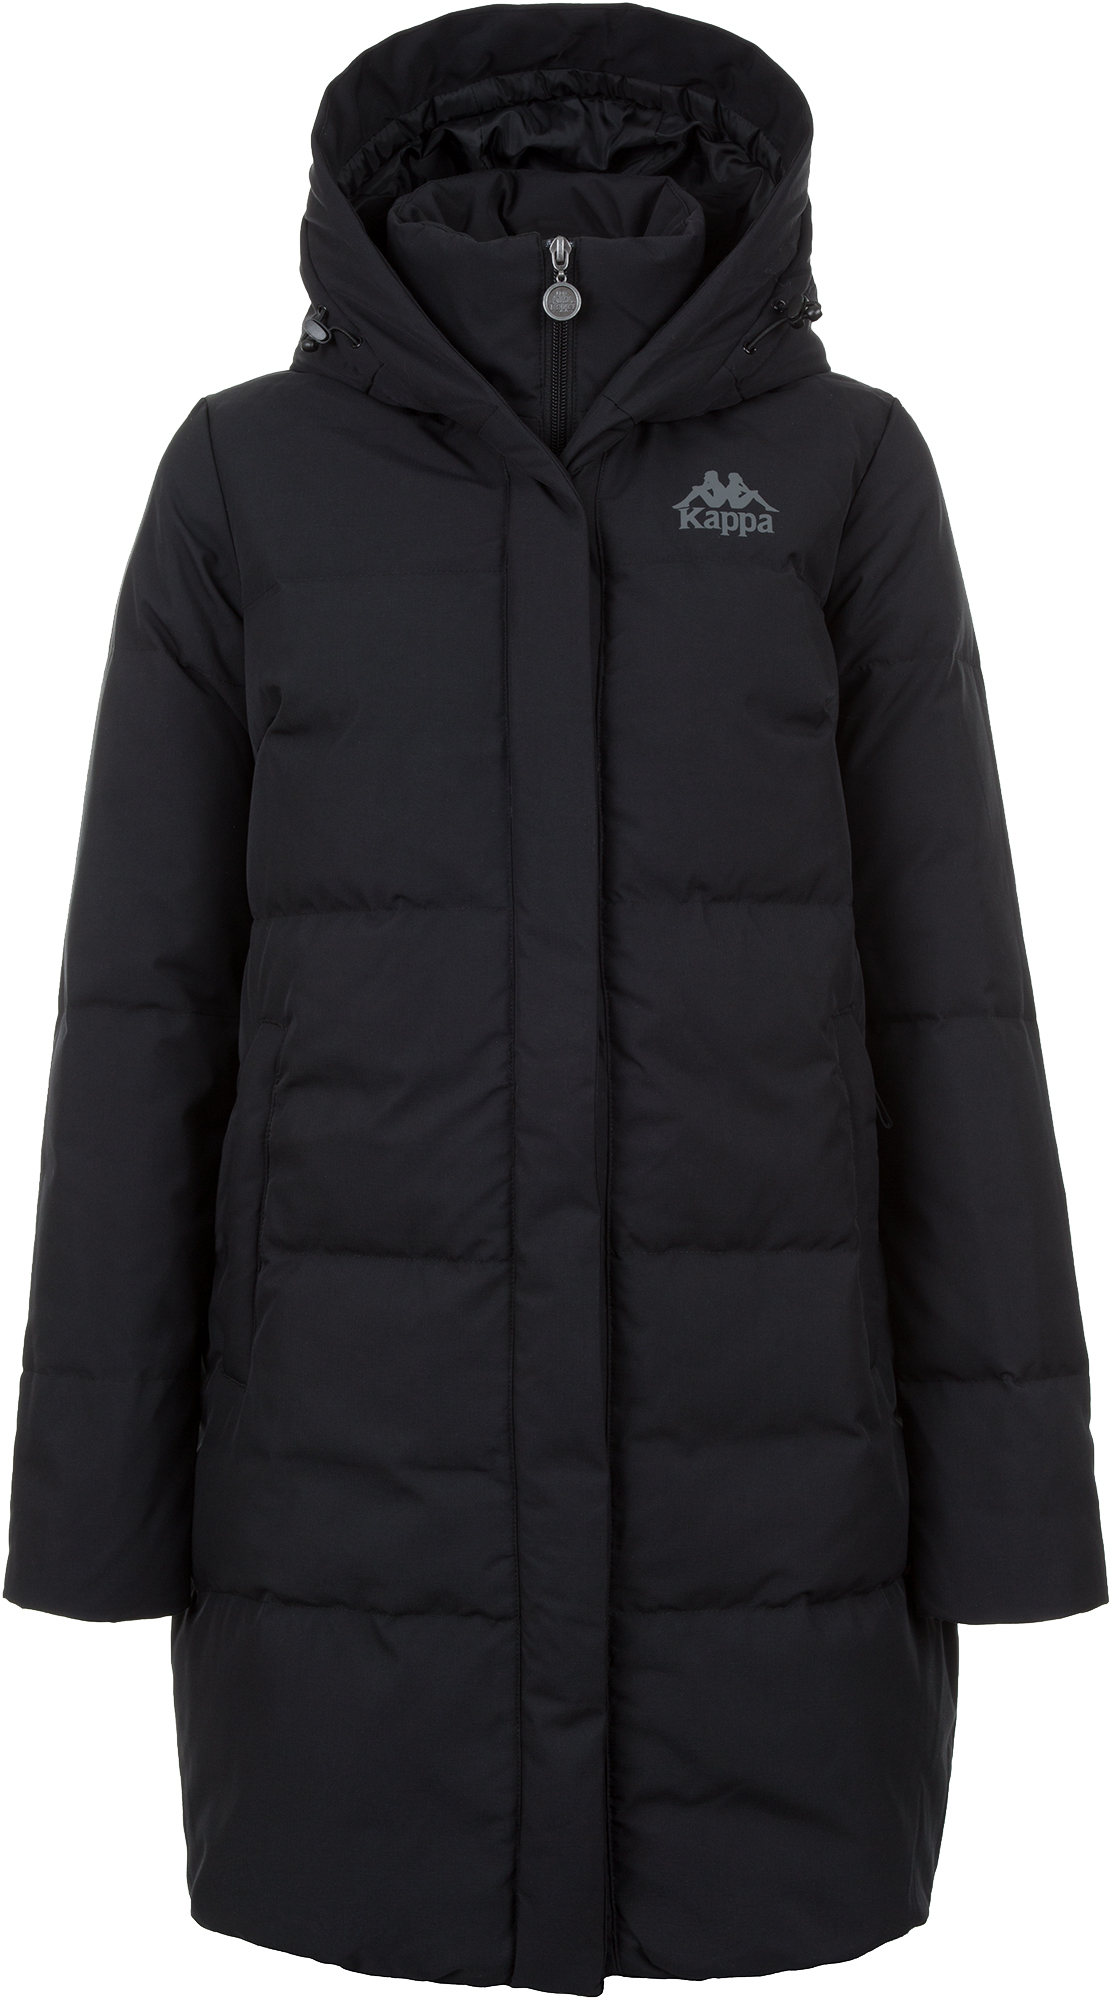 Kappa Куртка пуховая женская Kappa, размер 50